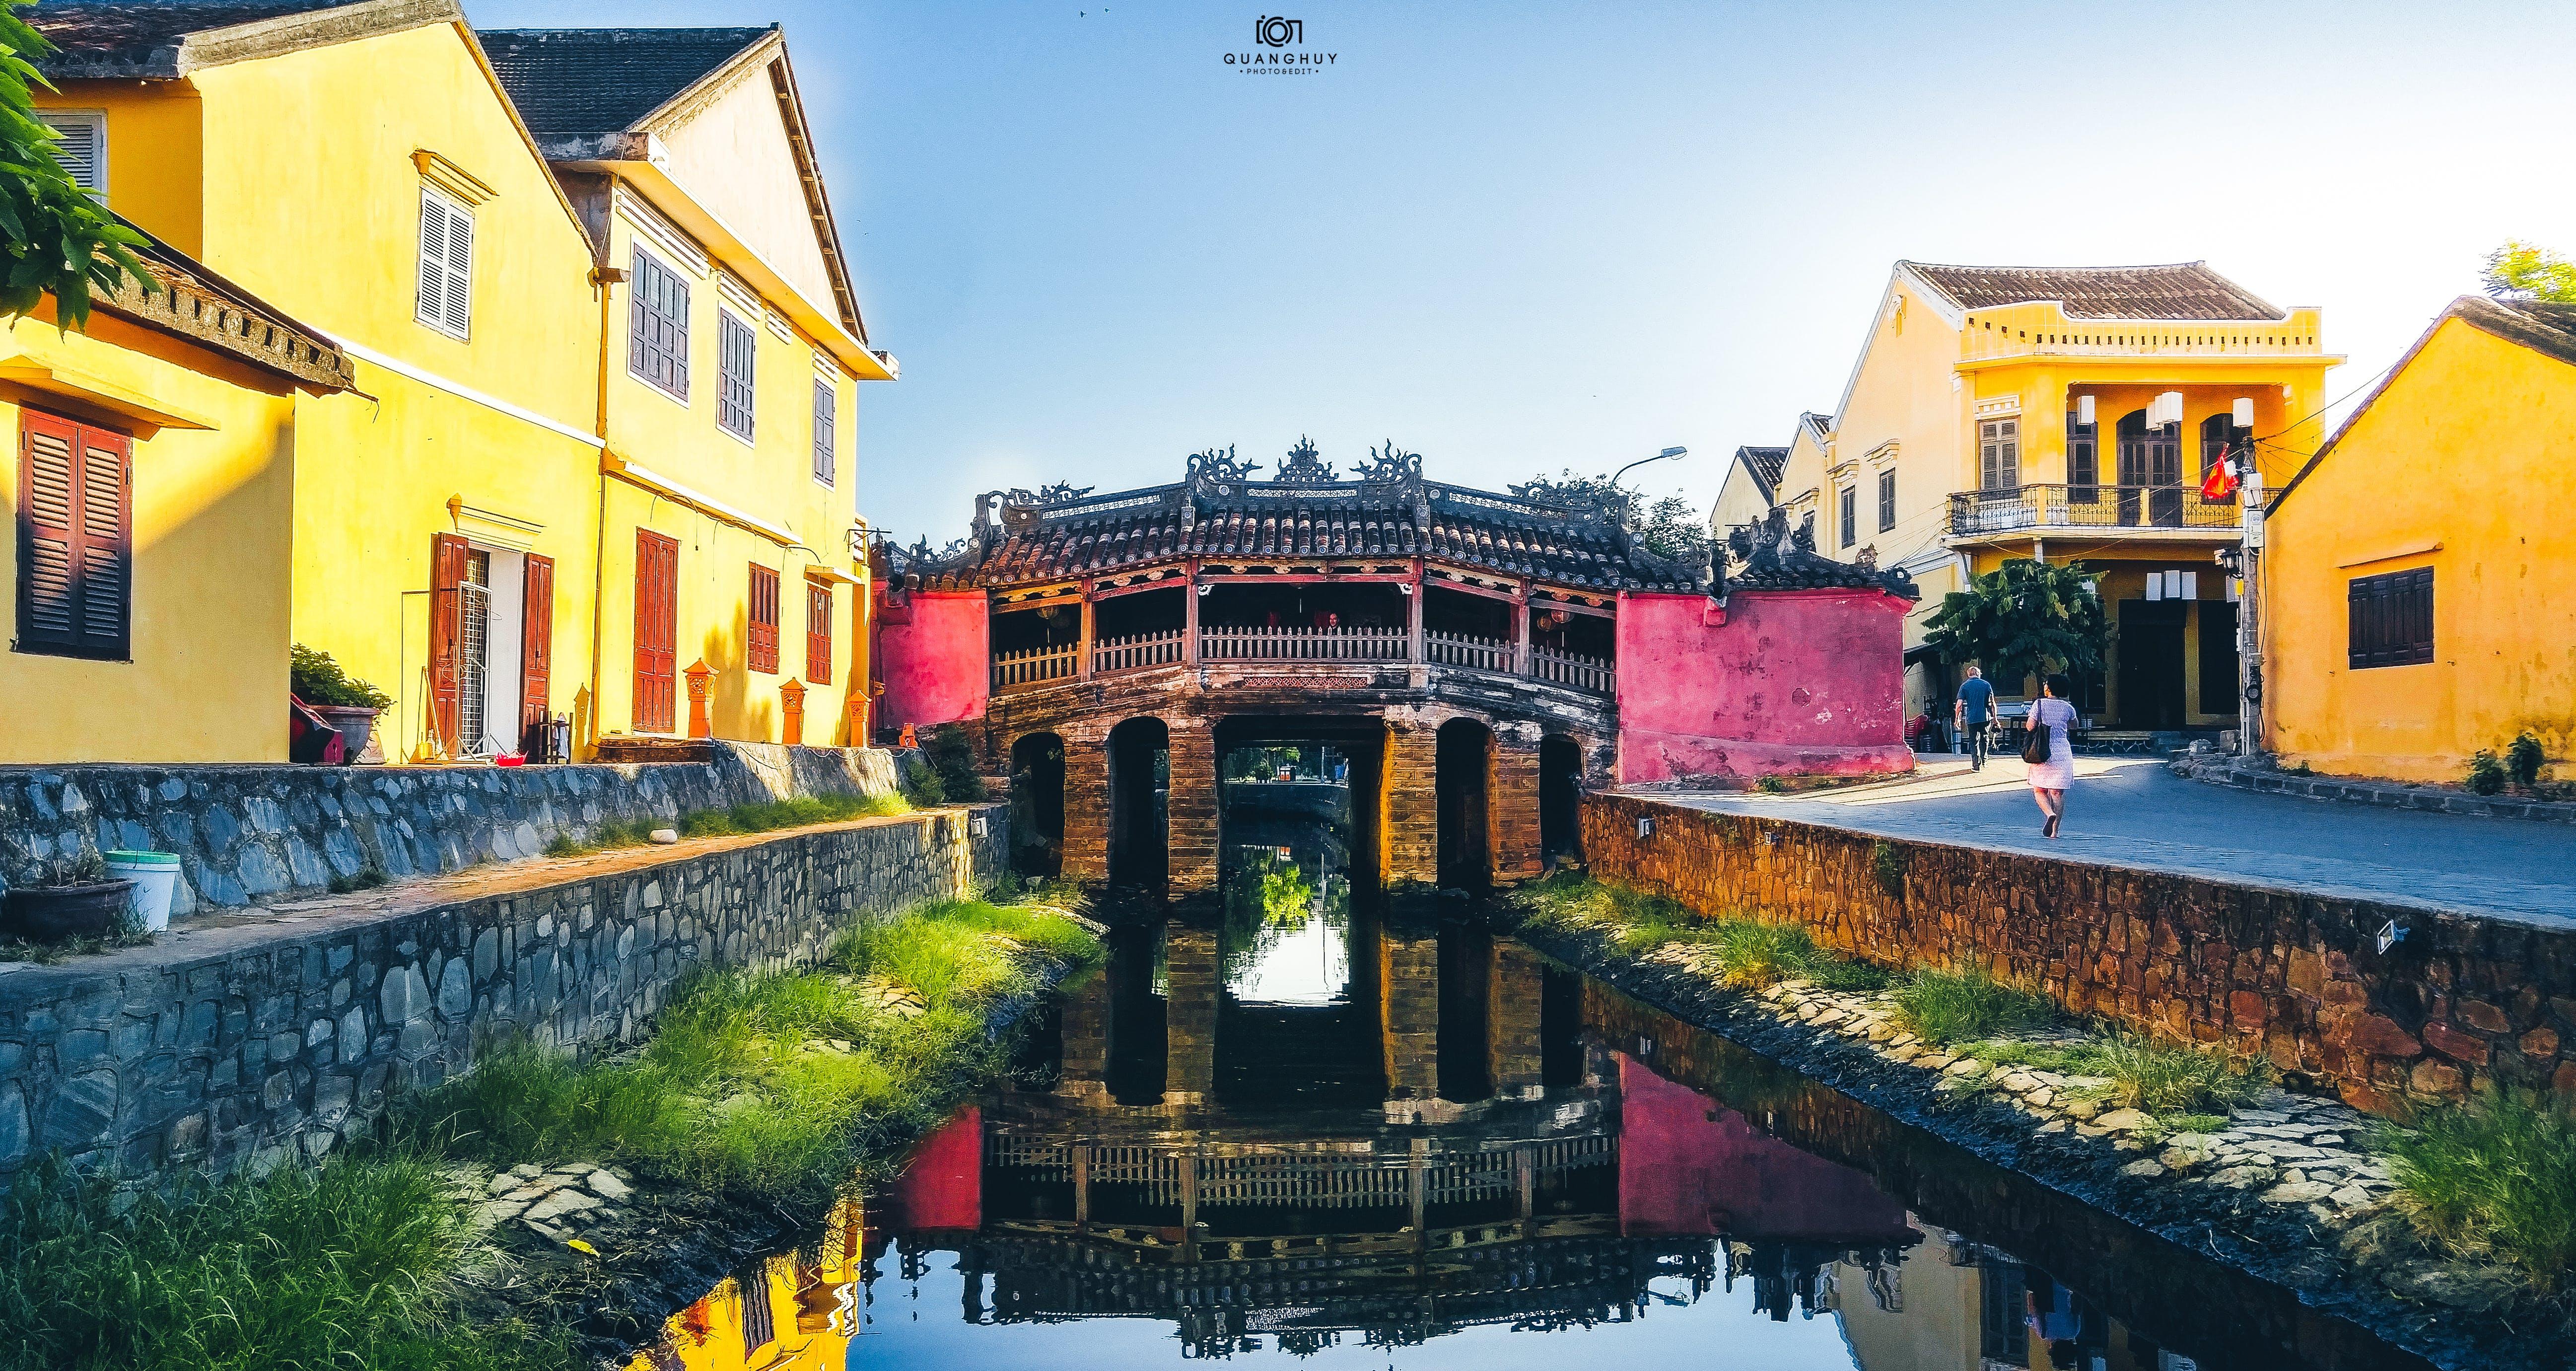 Free stock photo of chùa cầu, lg, mirror image, sunny